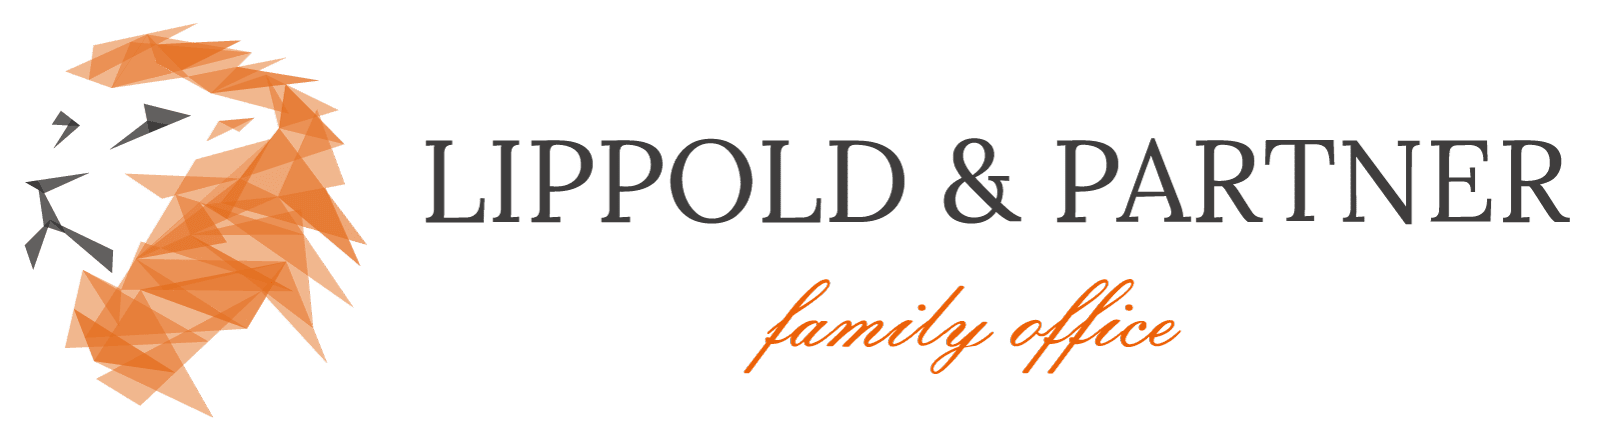 Lippold & Partner